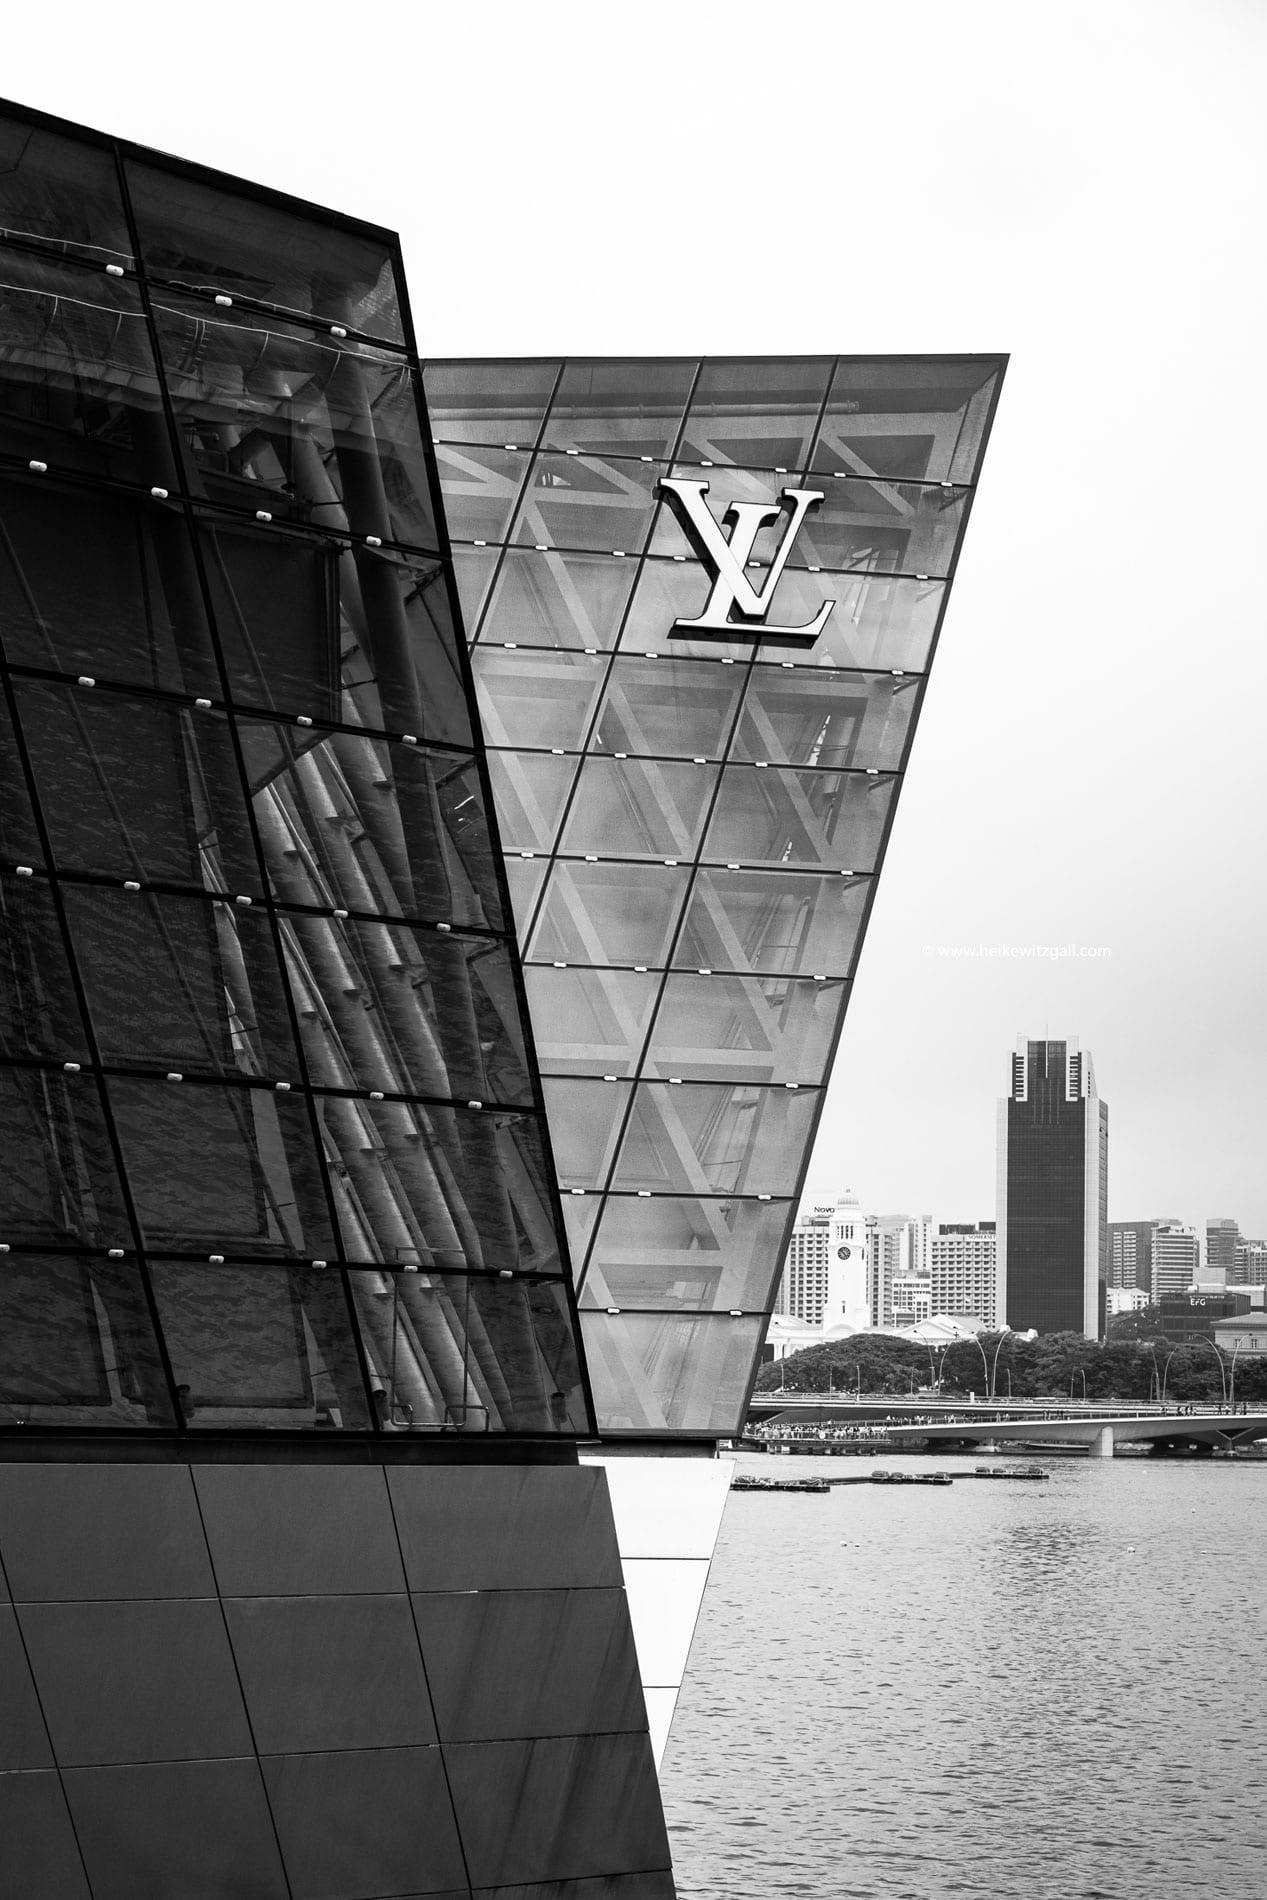 Witzgall Fotografie - Architekturfotografie